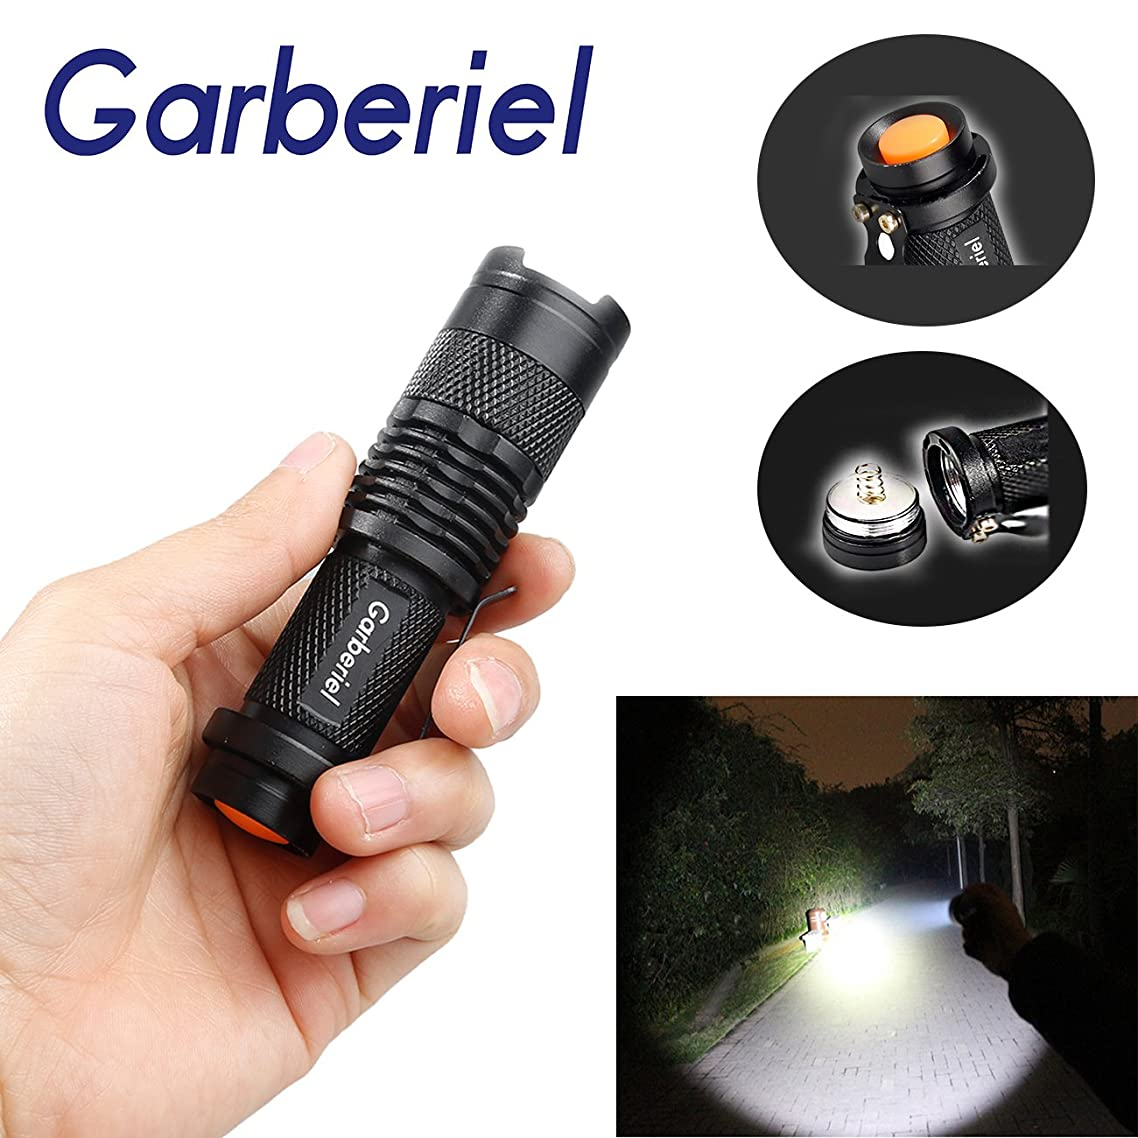 WishDeal 300lm Mini Q5 Led Flashlight Torch Adjustable Focus Zoom Light Lamp